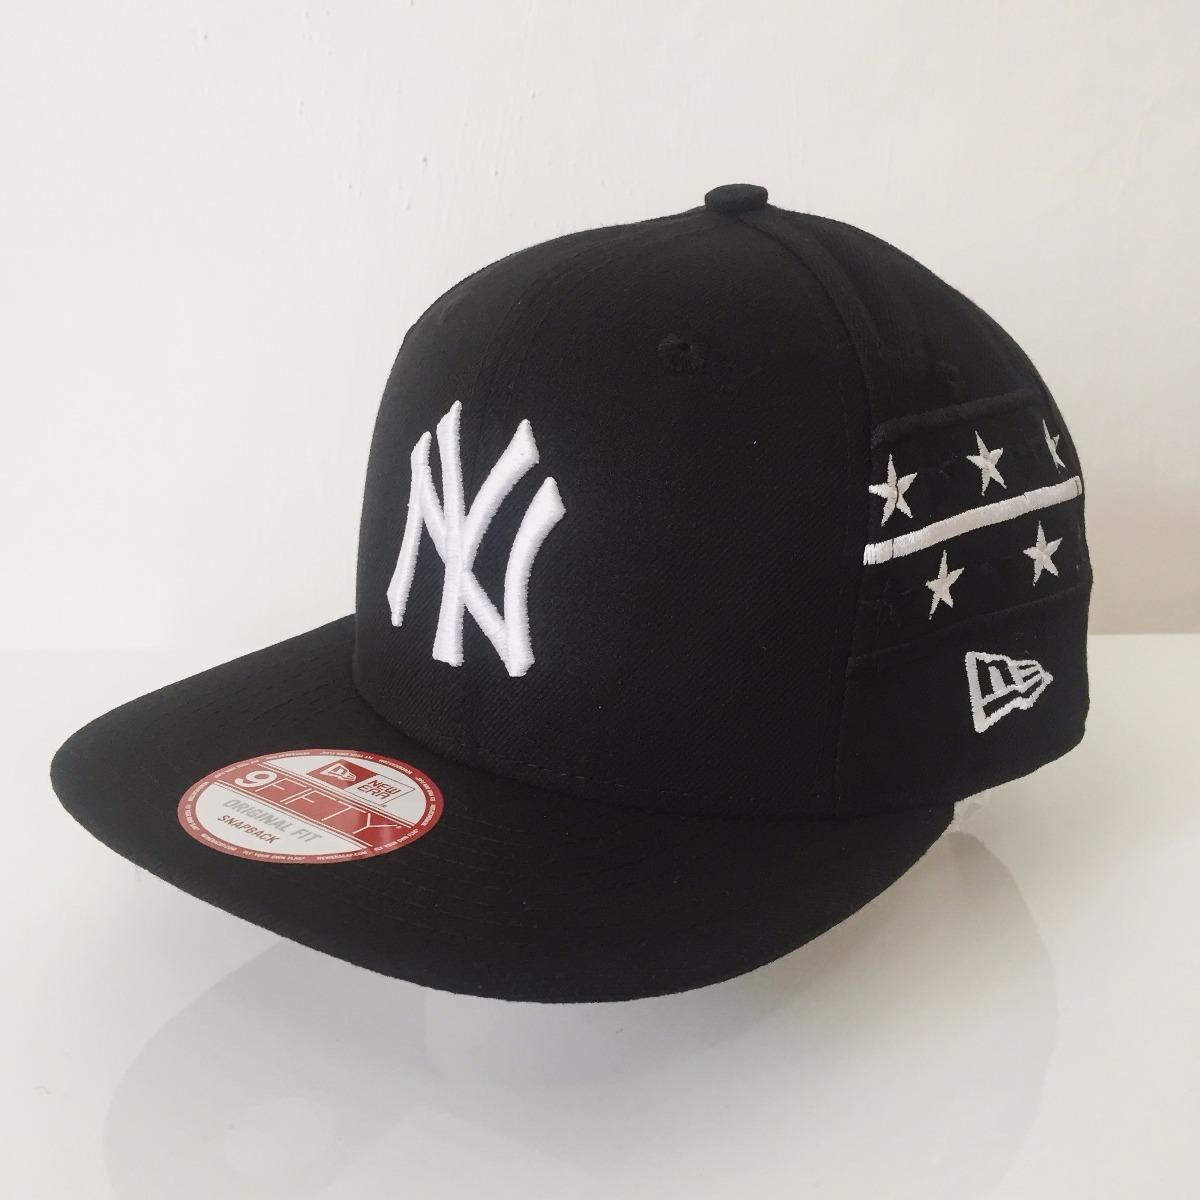 1b712e8fa22c8 Gorra New Era York Yankees Ny Mlb Snapback -   549.00 en Mercado Libre